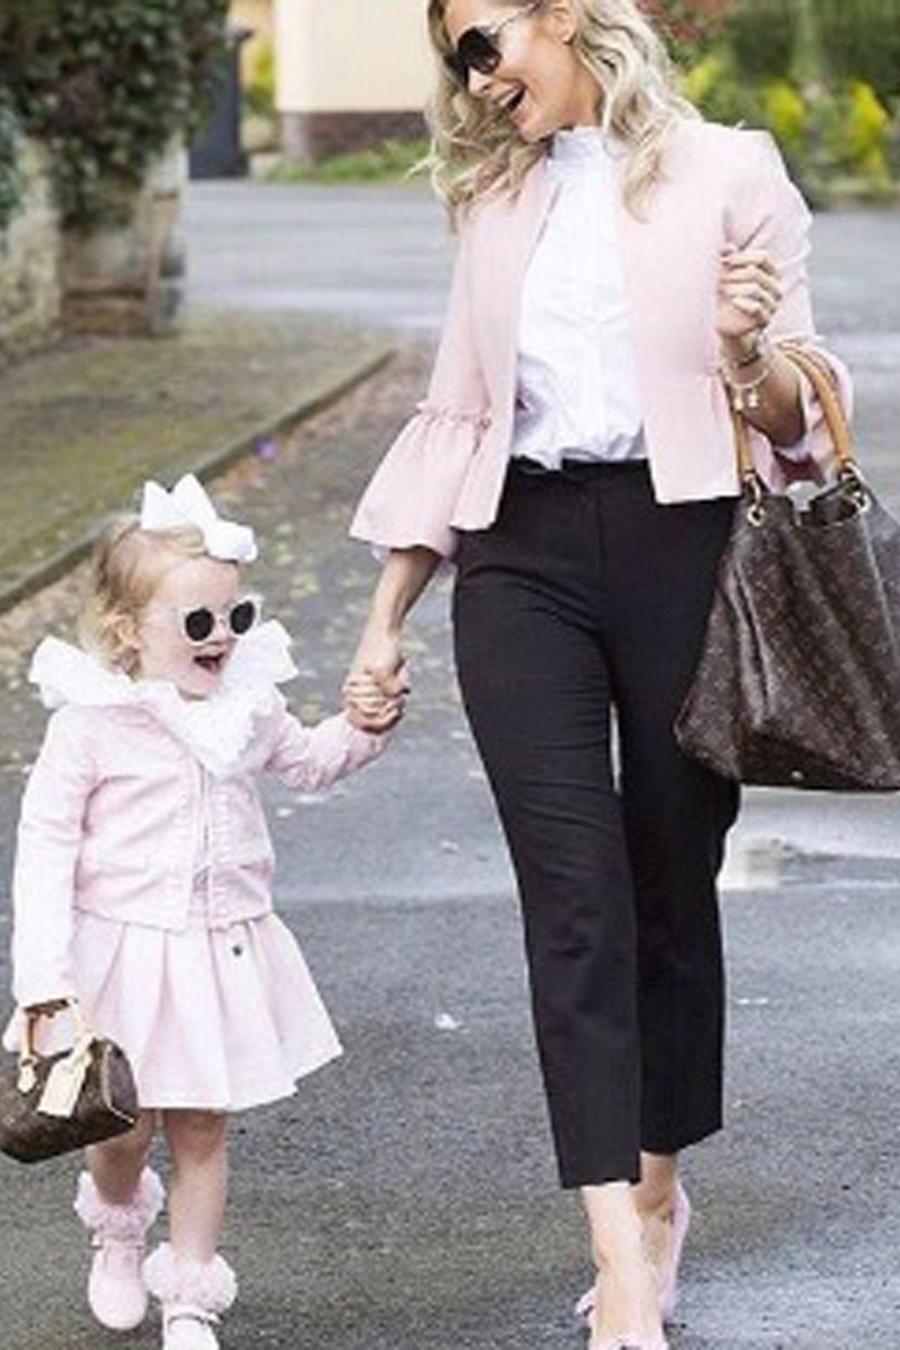 Mamá e hija caminando tomadas de la mano